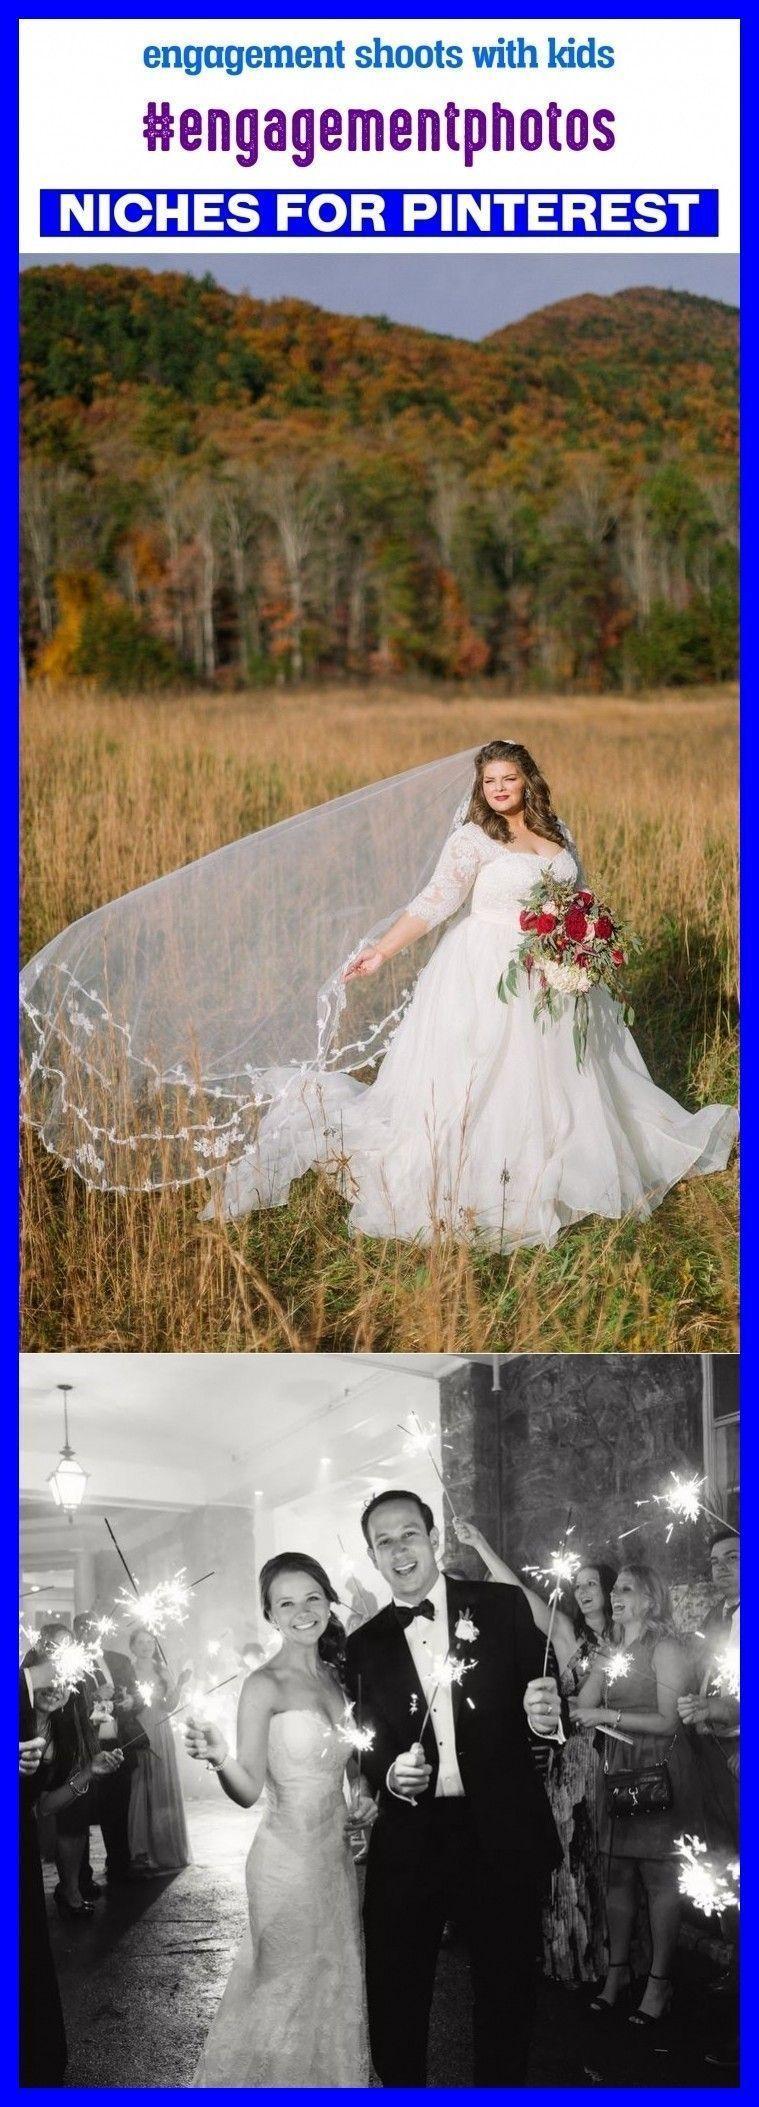 Wedding dresses  #engagement #pictures #ideas #outfits fall engagement pictures ideas outfits, fall engagement photos outfit what to wear, fall engage...